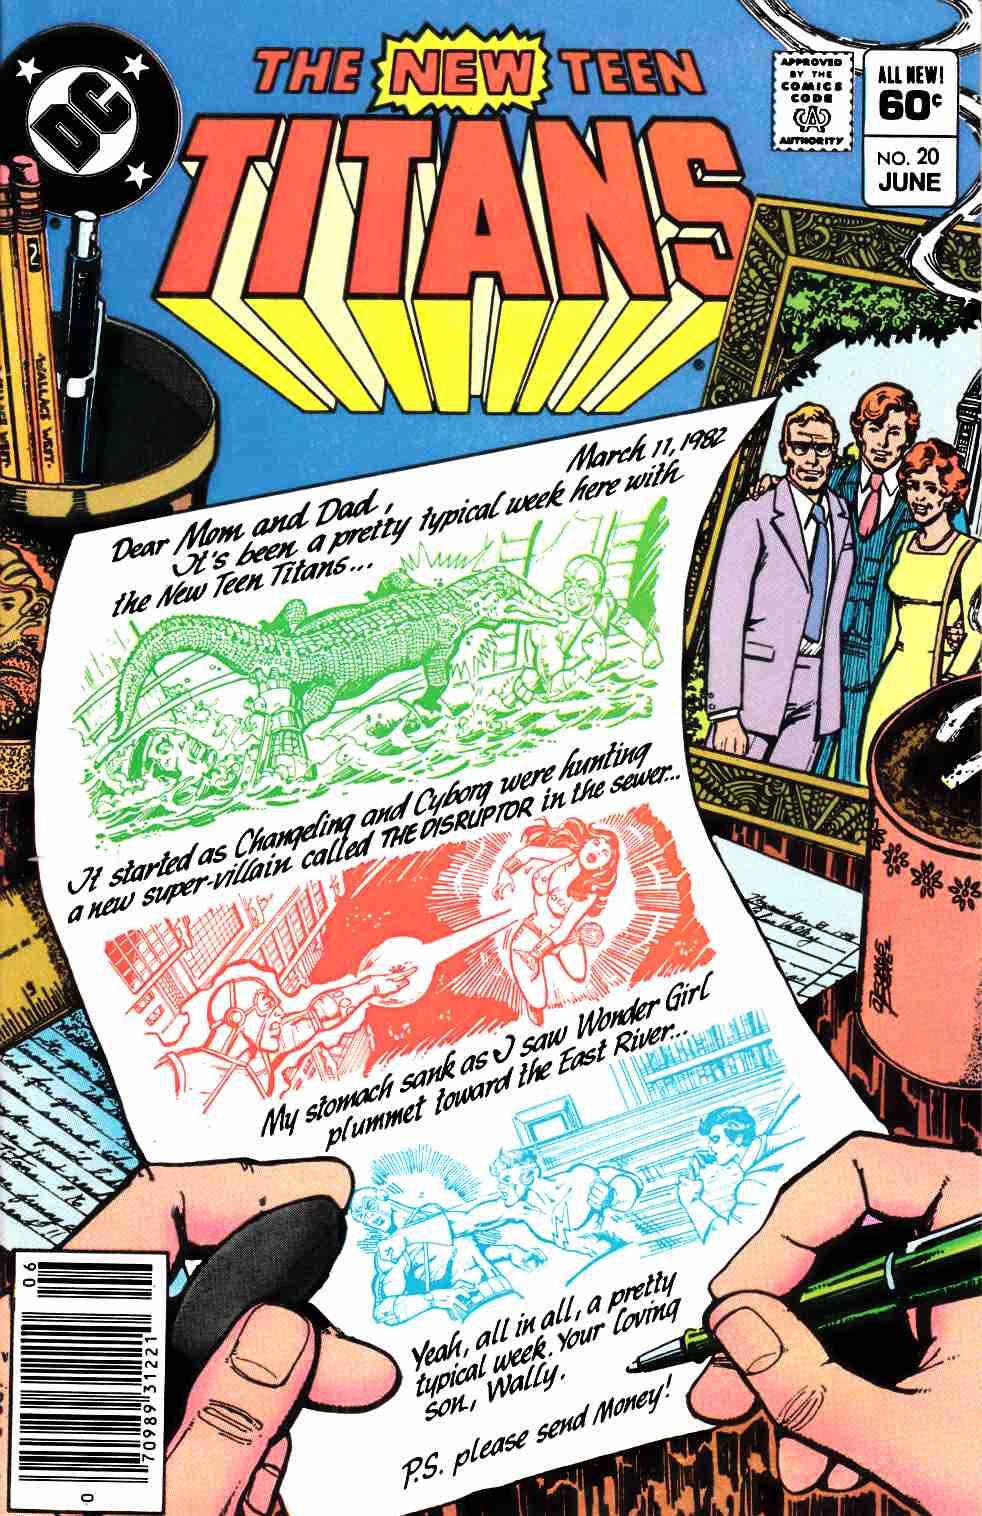 New Teen Titans #20 Newsstand Edition Very Fine (8.0) [DC Comic] –  Dreamlandcomics.com Online Store